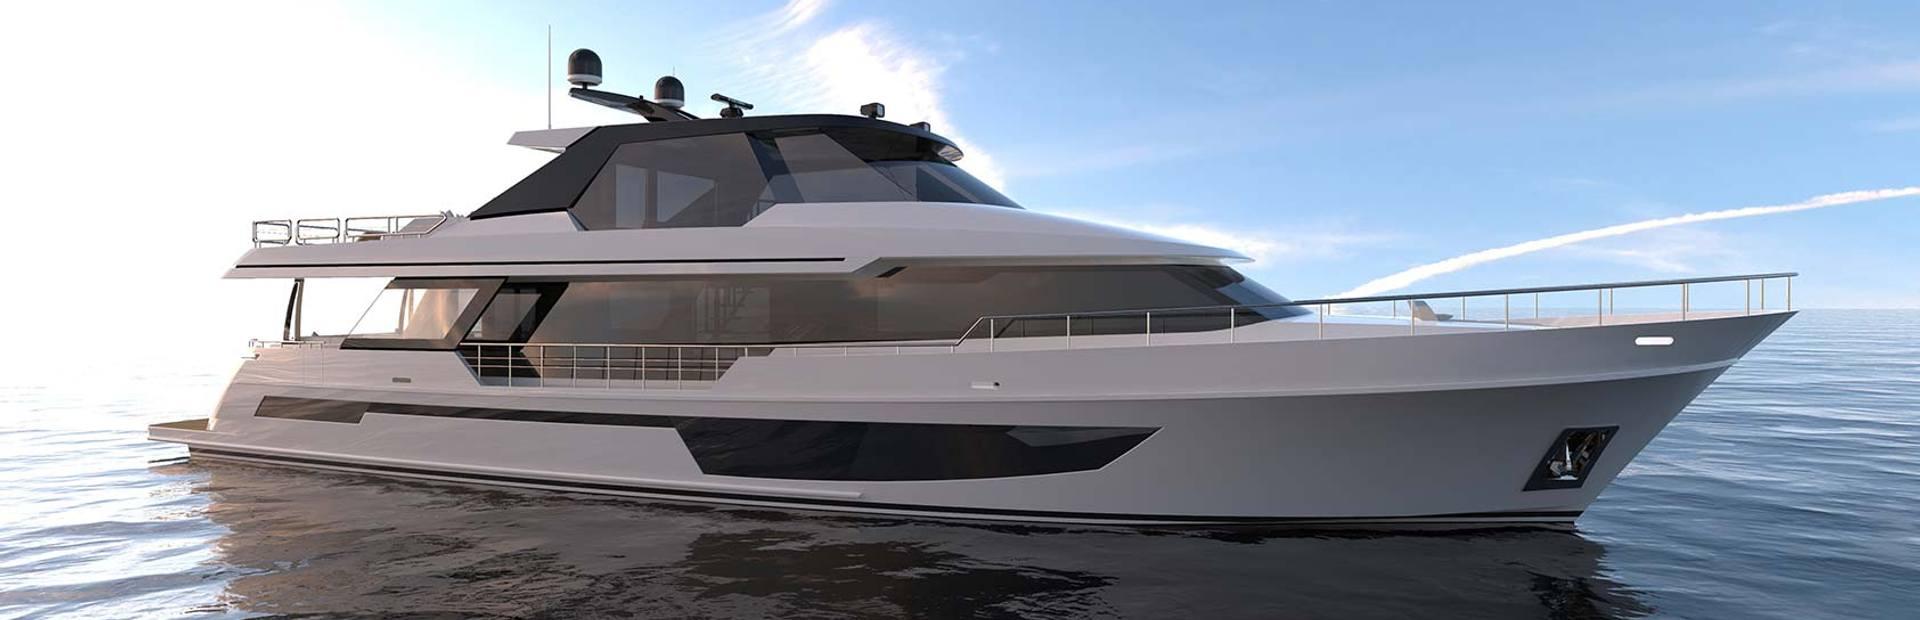 32L Yacht Charter